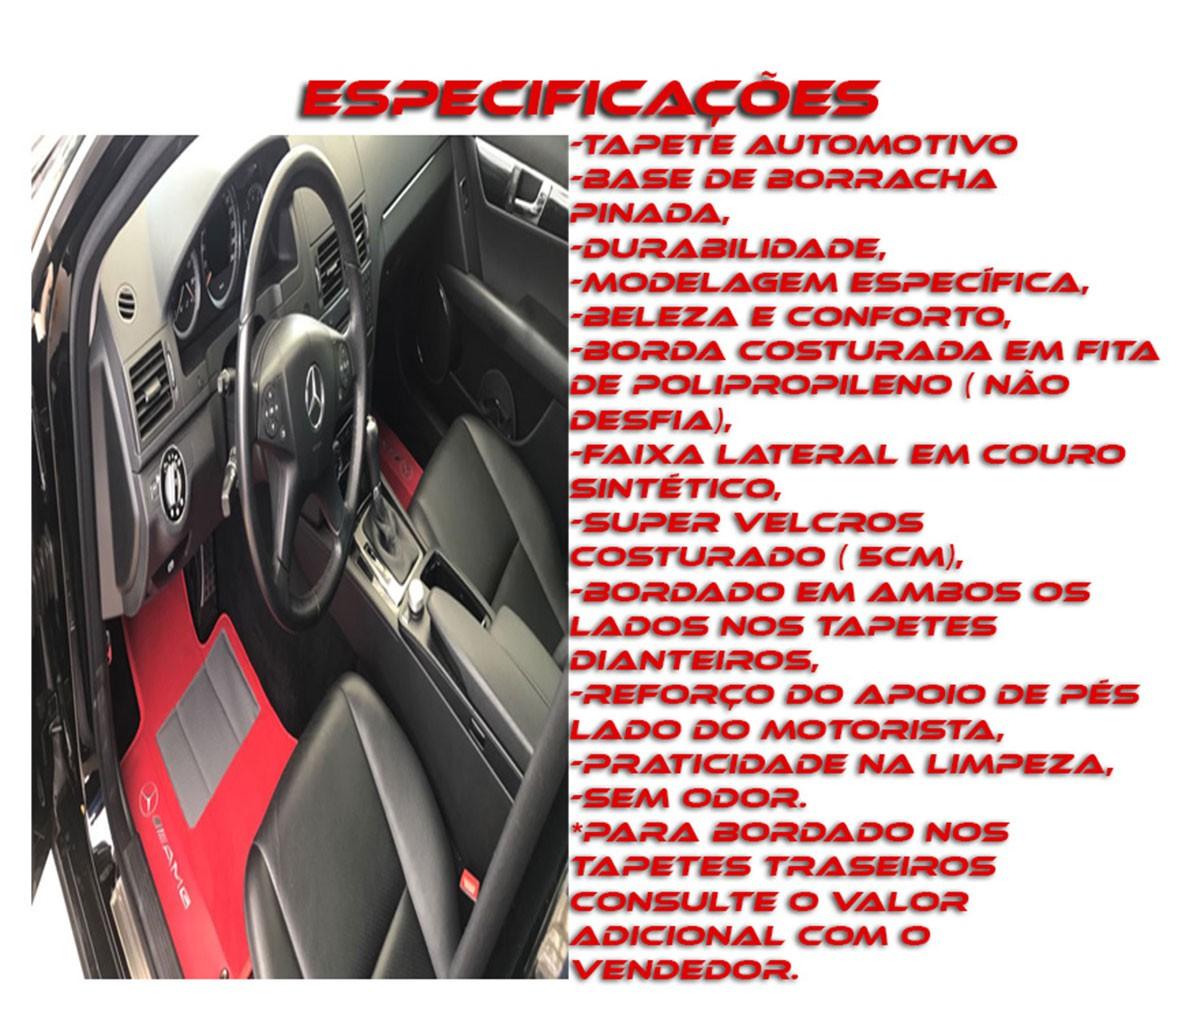 Porta Mala Toyota Yaris Carpete Luxo Borracha Base Pinada